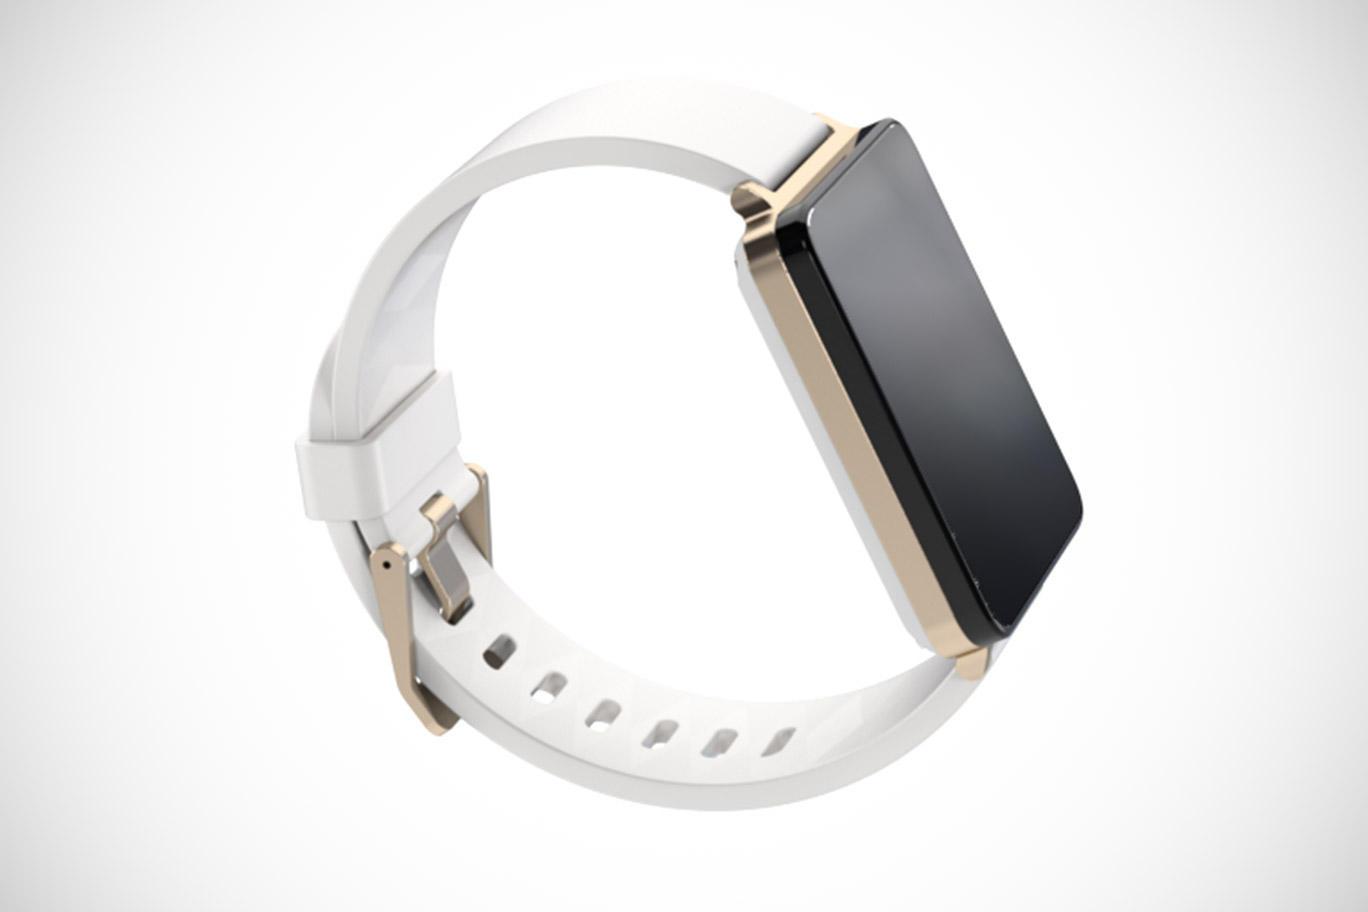 LG G Watch - inteligentny zegarek kompatybilny z Android Wear